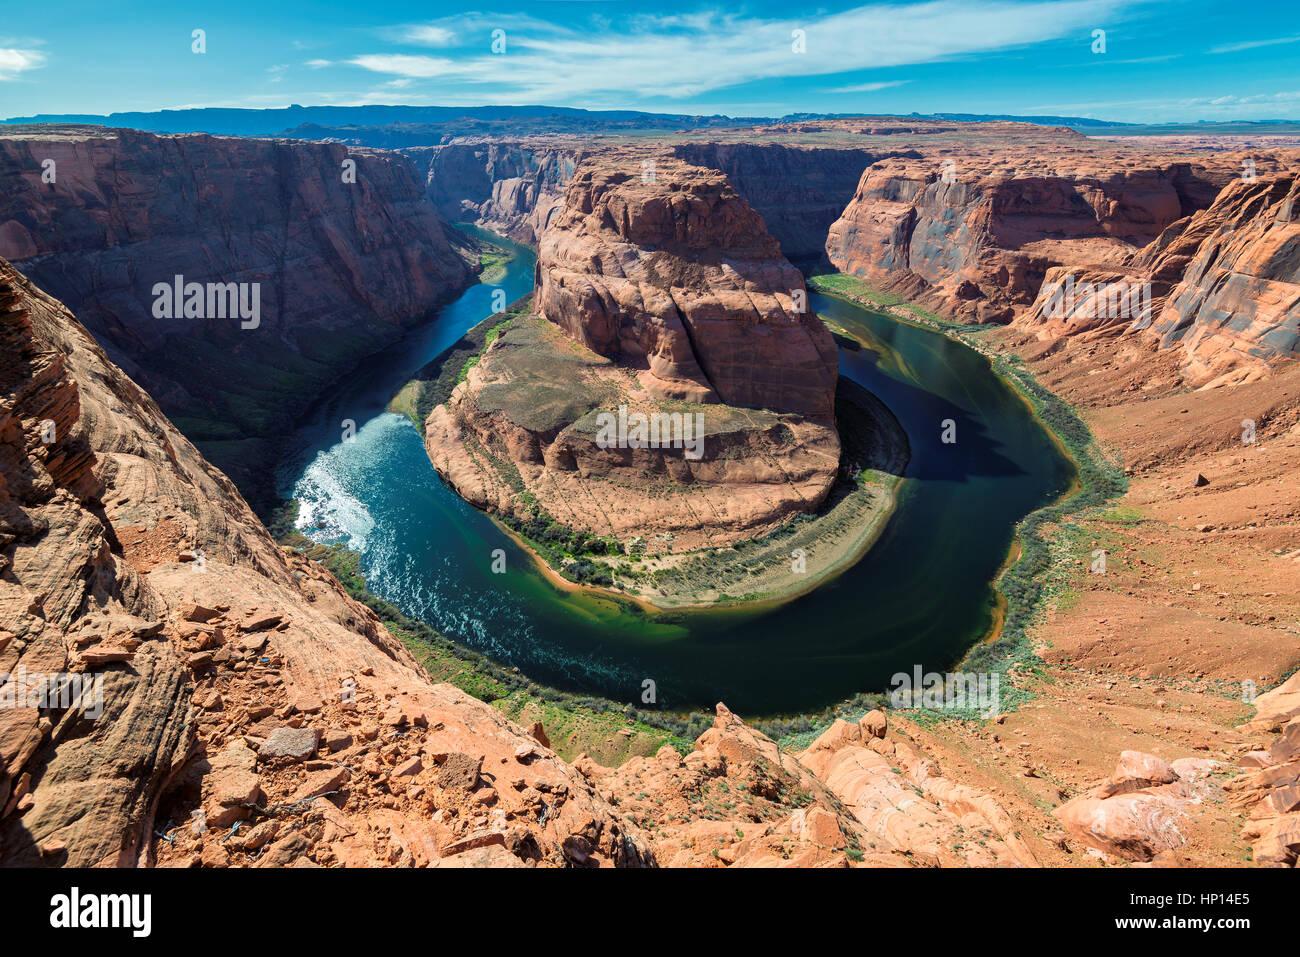 Berühmten Horseshoe Bend des Colorado River im nördlichen Arizona Stockfoto